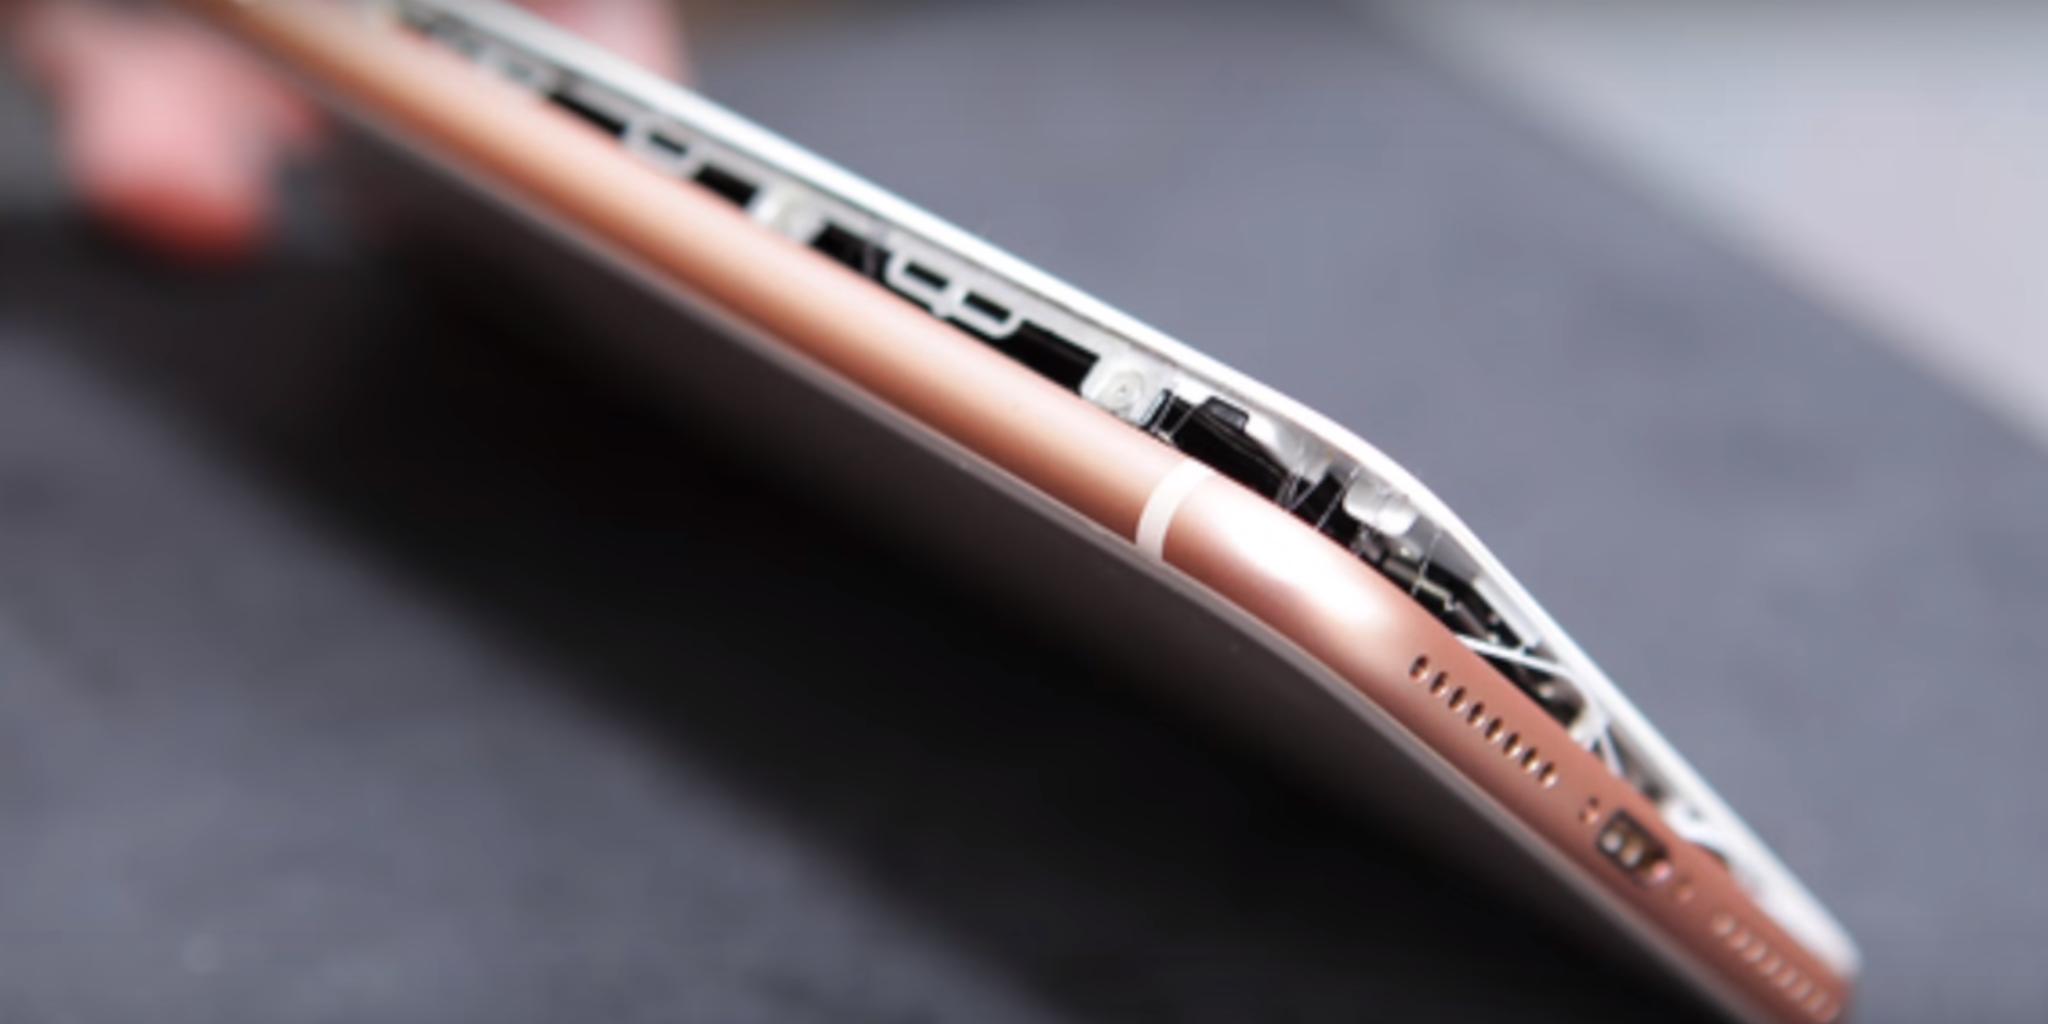 splitgate new apple iphone 8 plus